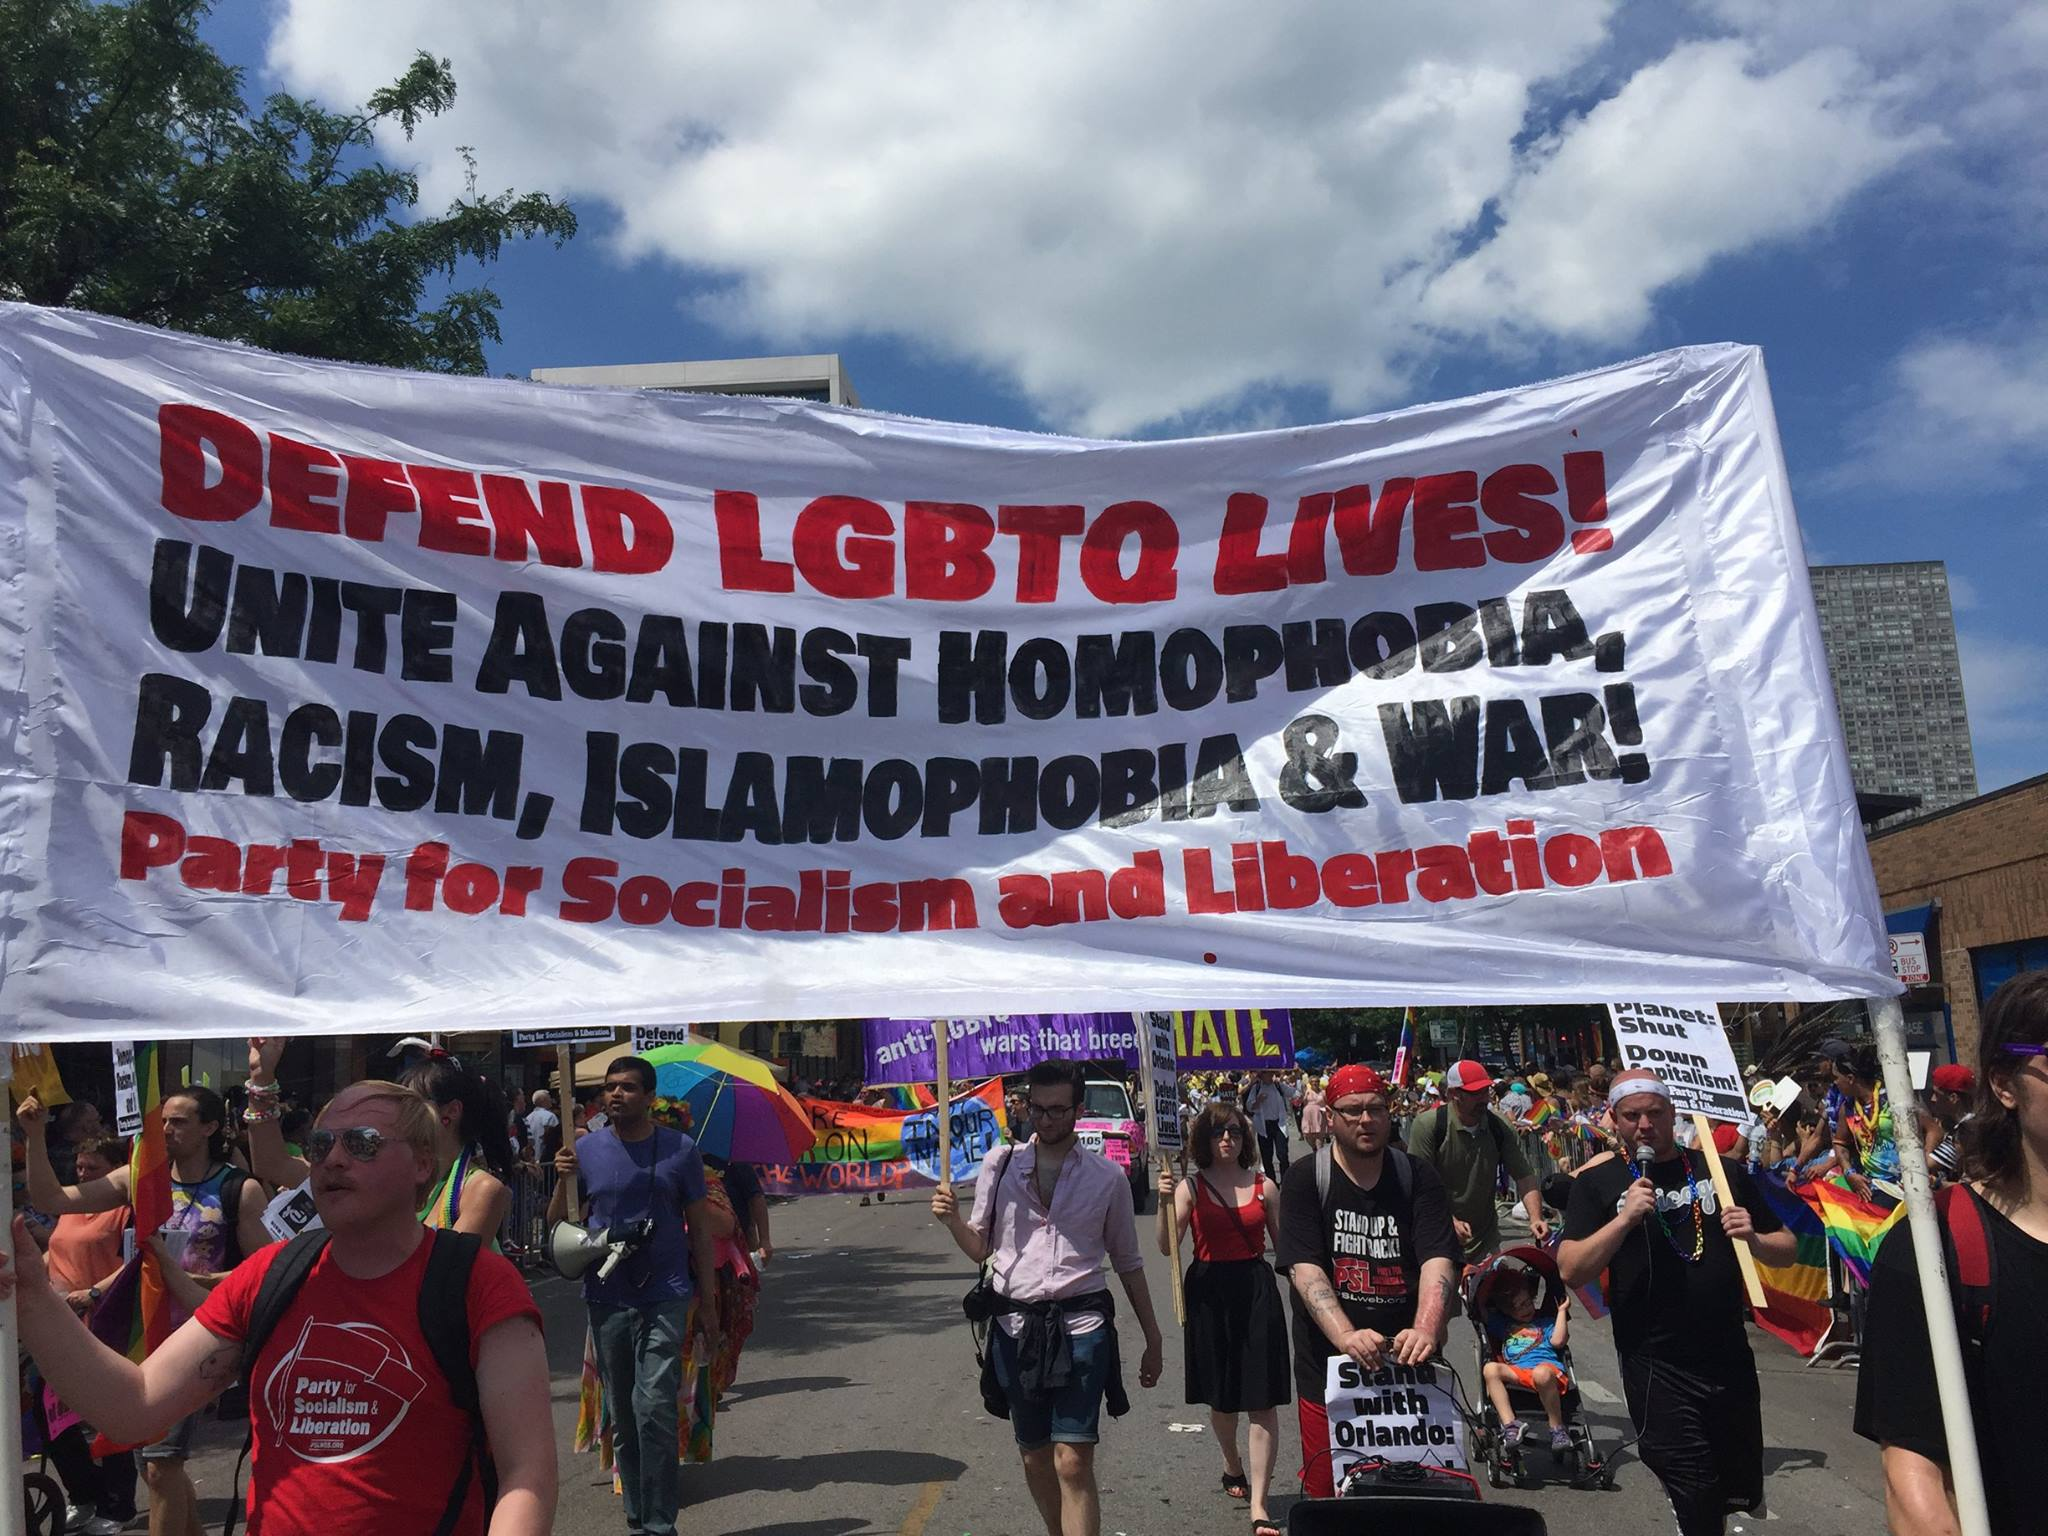 Photo of Chicago 4 Orlando contingent in massive PRIDE parade